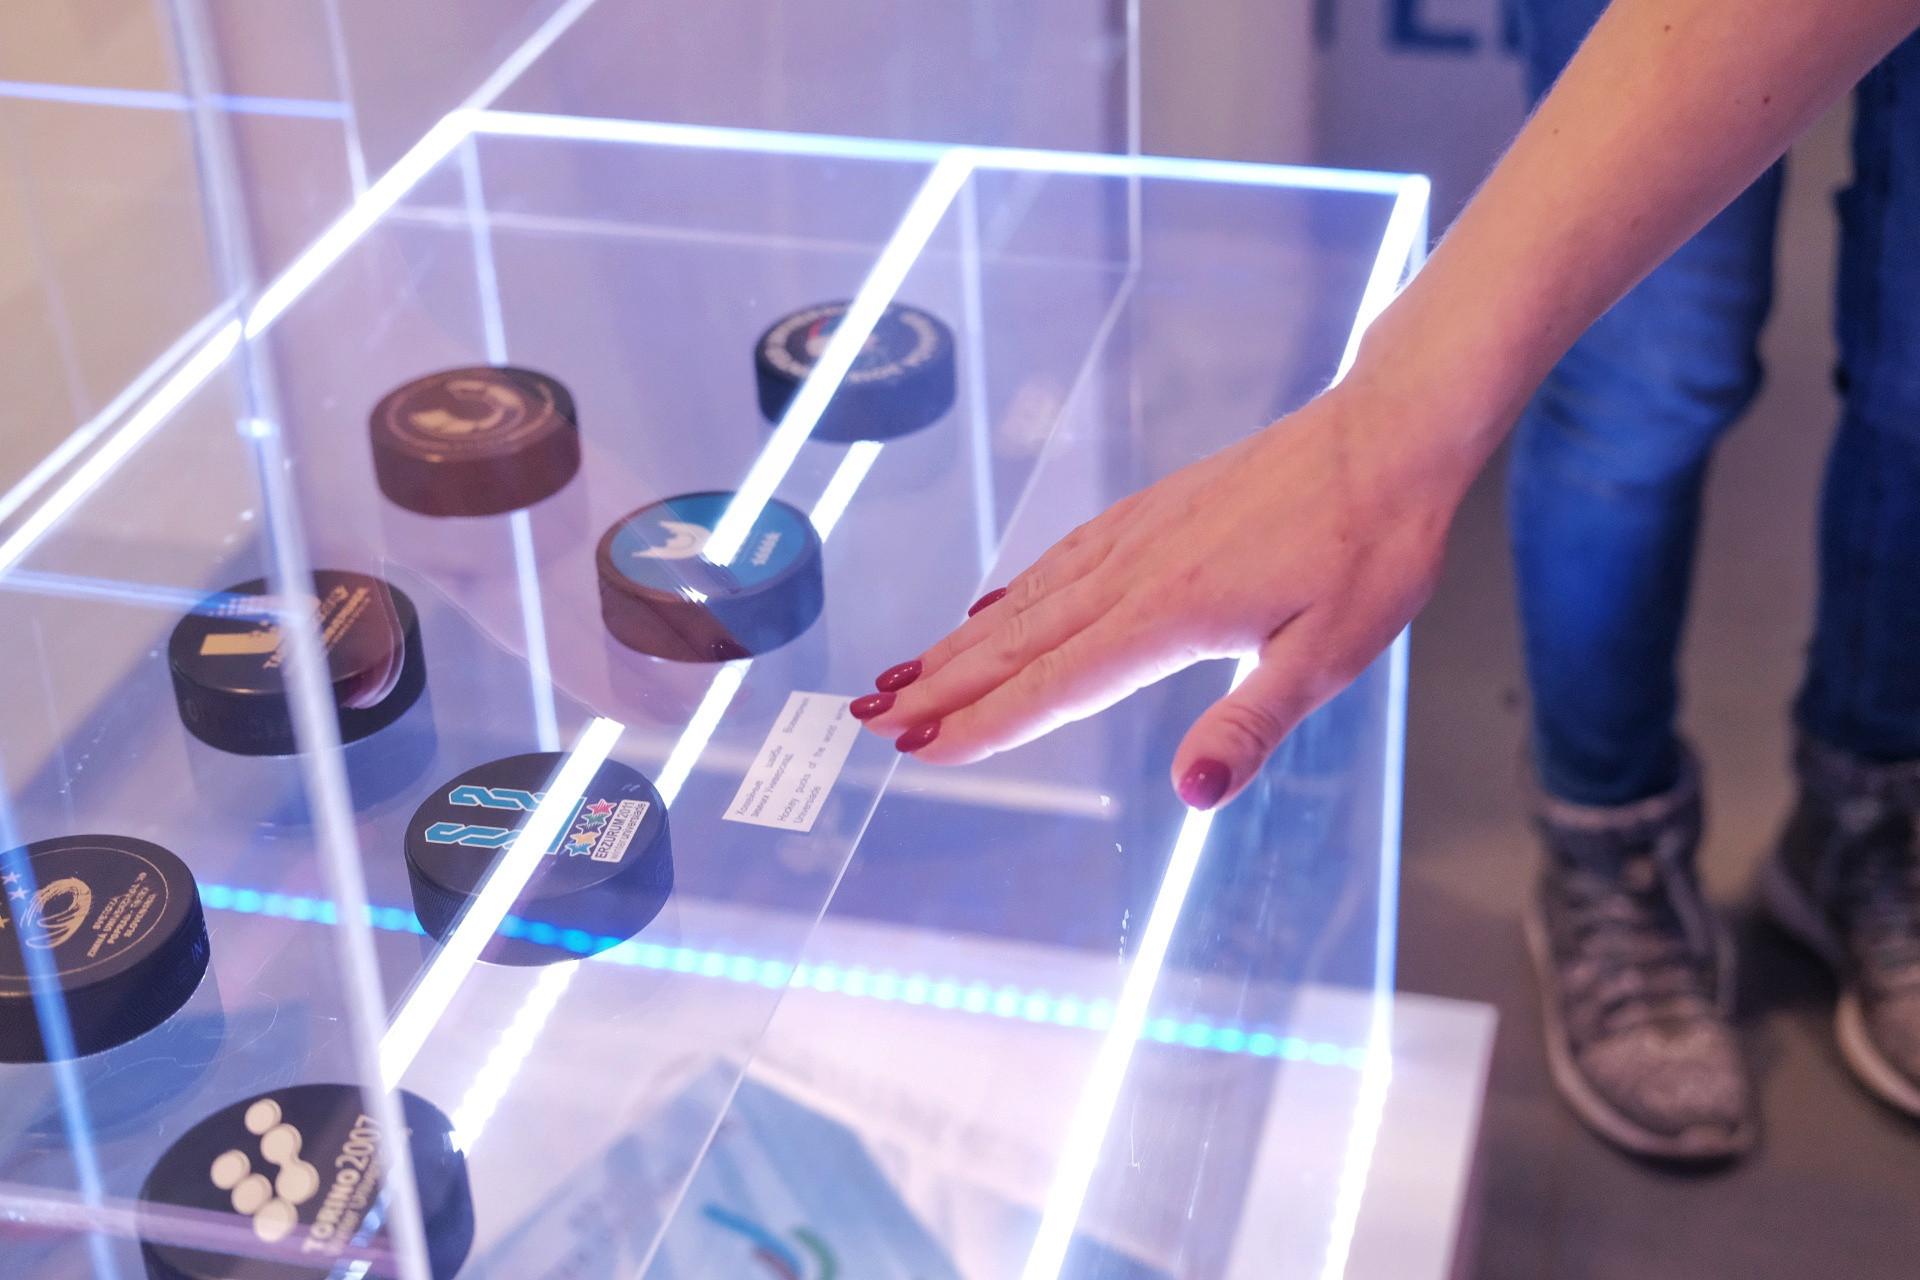 Krasnoyarsk 2019 museum opens in Universiade Village